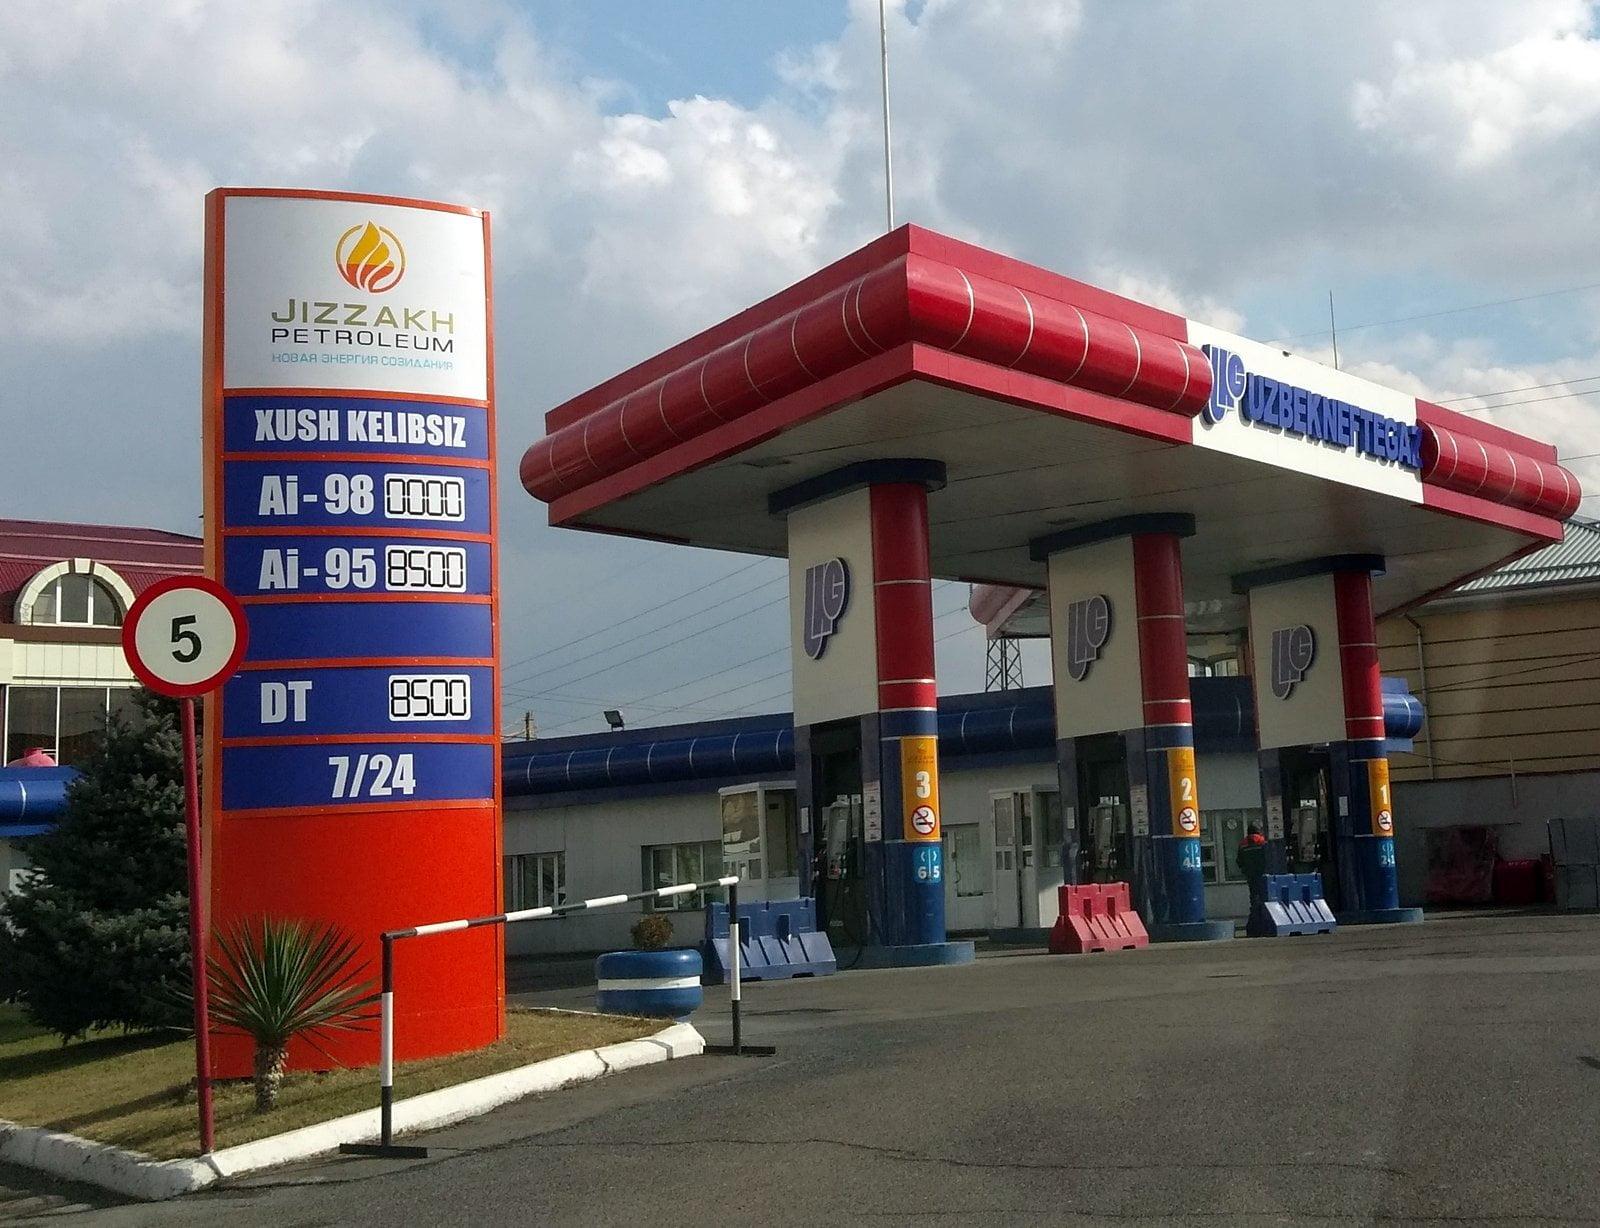 Jazzakh Petroleum Заправка Ташкент Цены на бензин в Узбекистане